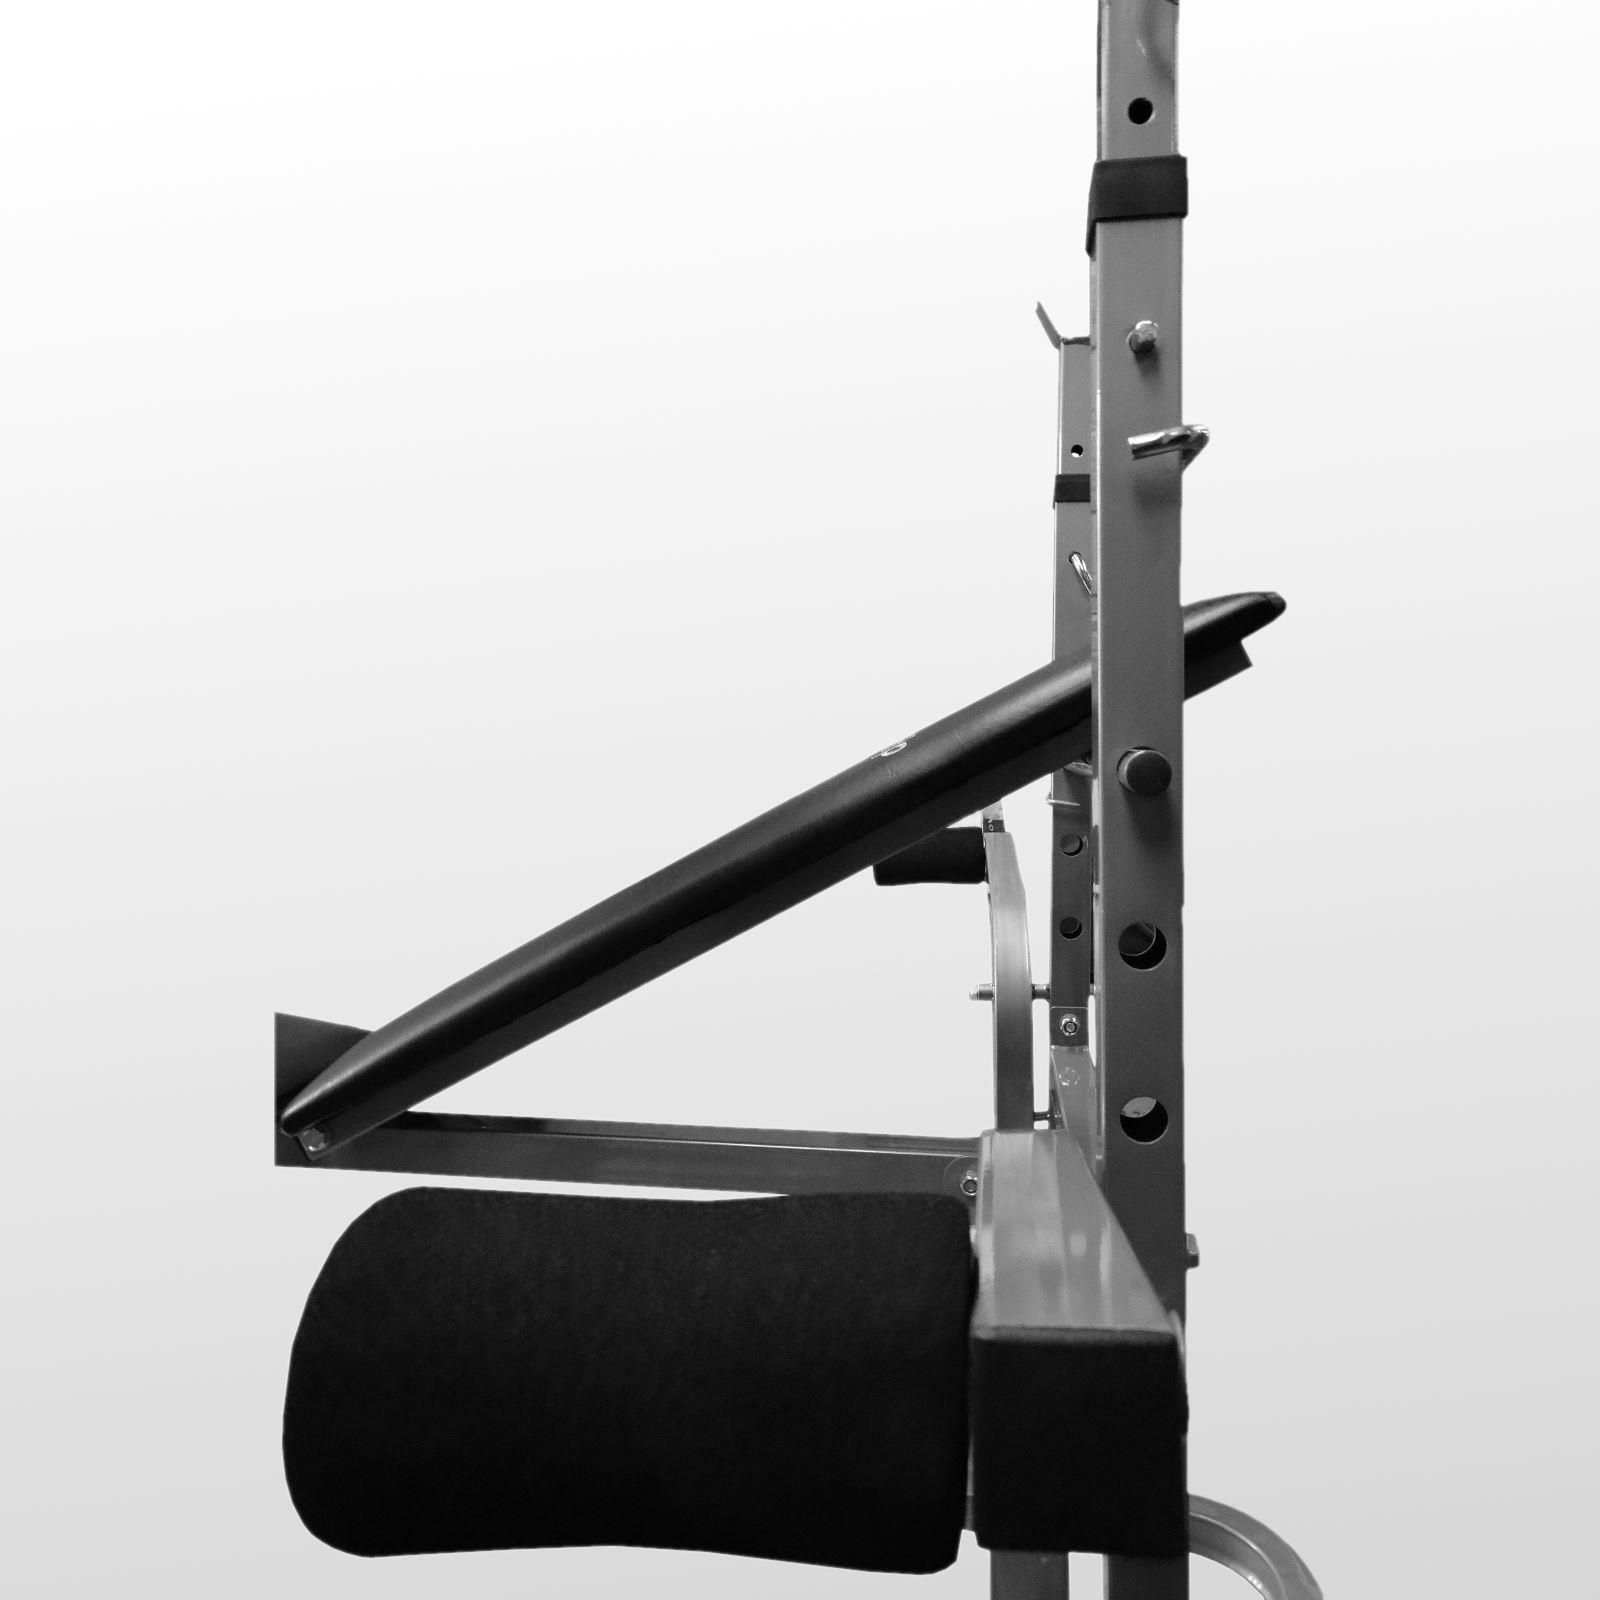 Bodyrip Folding Weight Bench Amp 80kg Barbell Set Gym